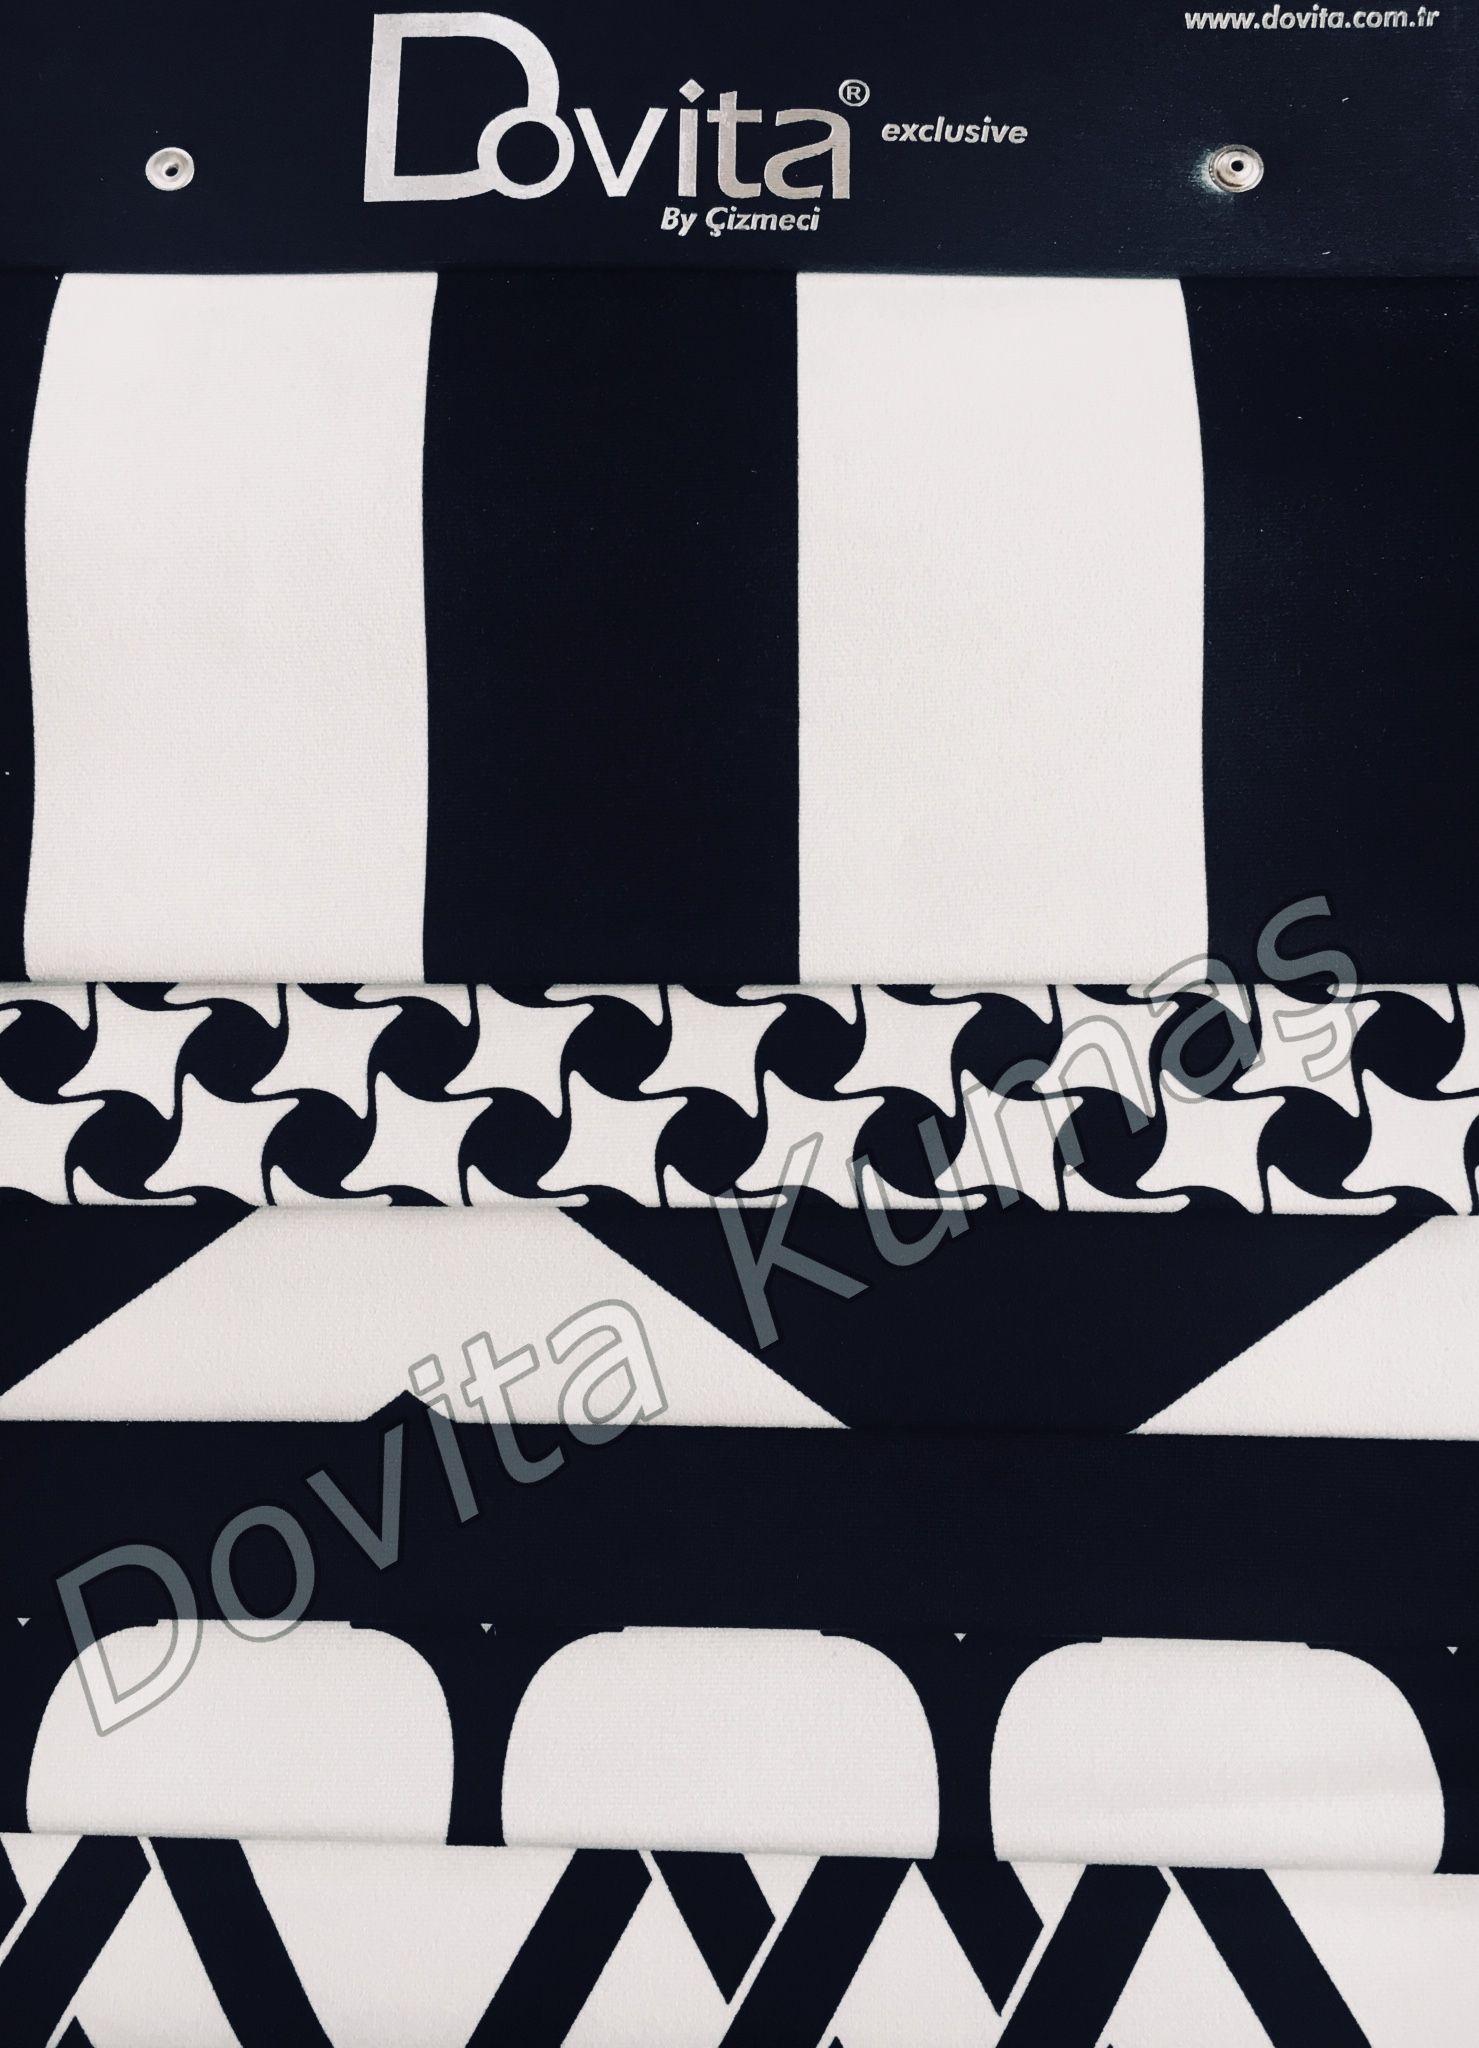 Dovita Dosemelik Kumas Istanbul Siyah Beyaz Kartela Instagram Dovitakumas Interiordesign Homedecoration Homedecor D Dosemelik Kumaslar Kumas Desenler